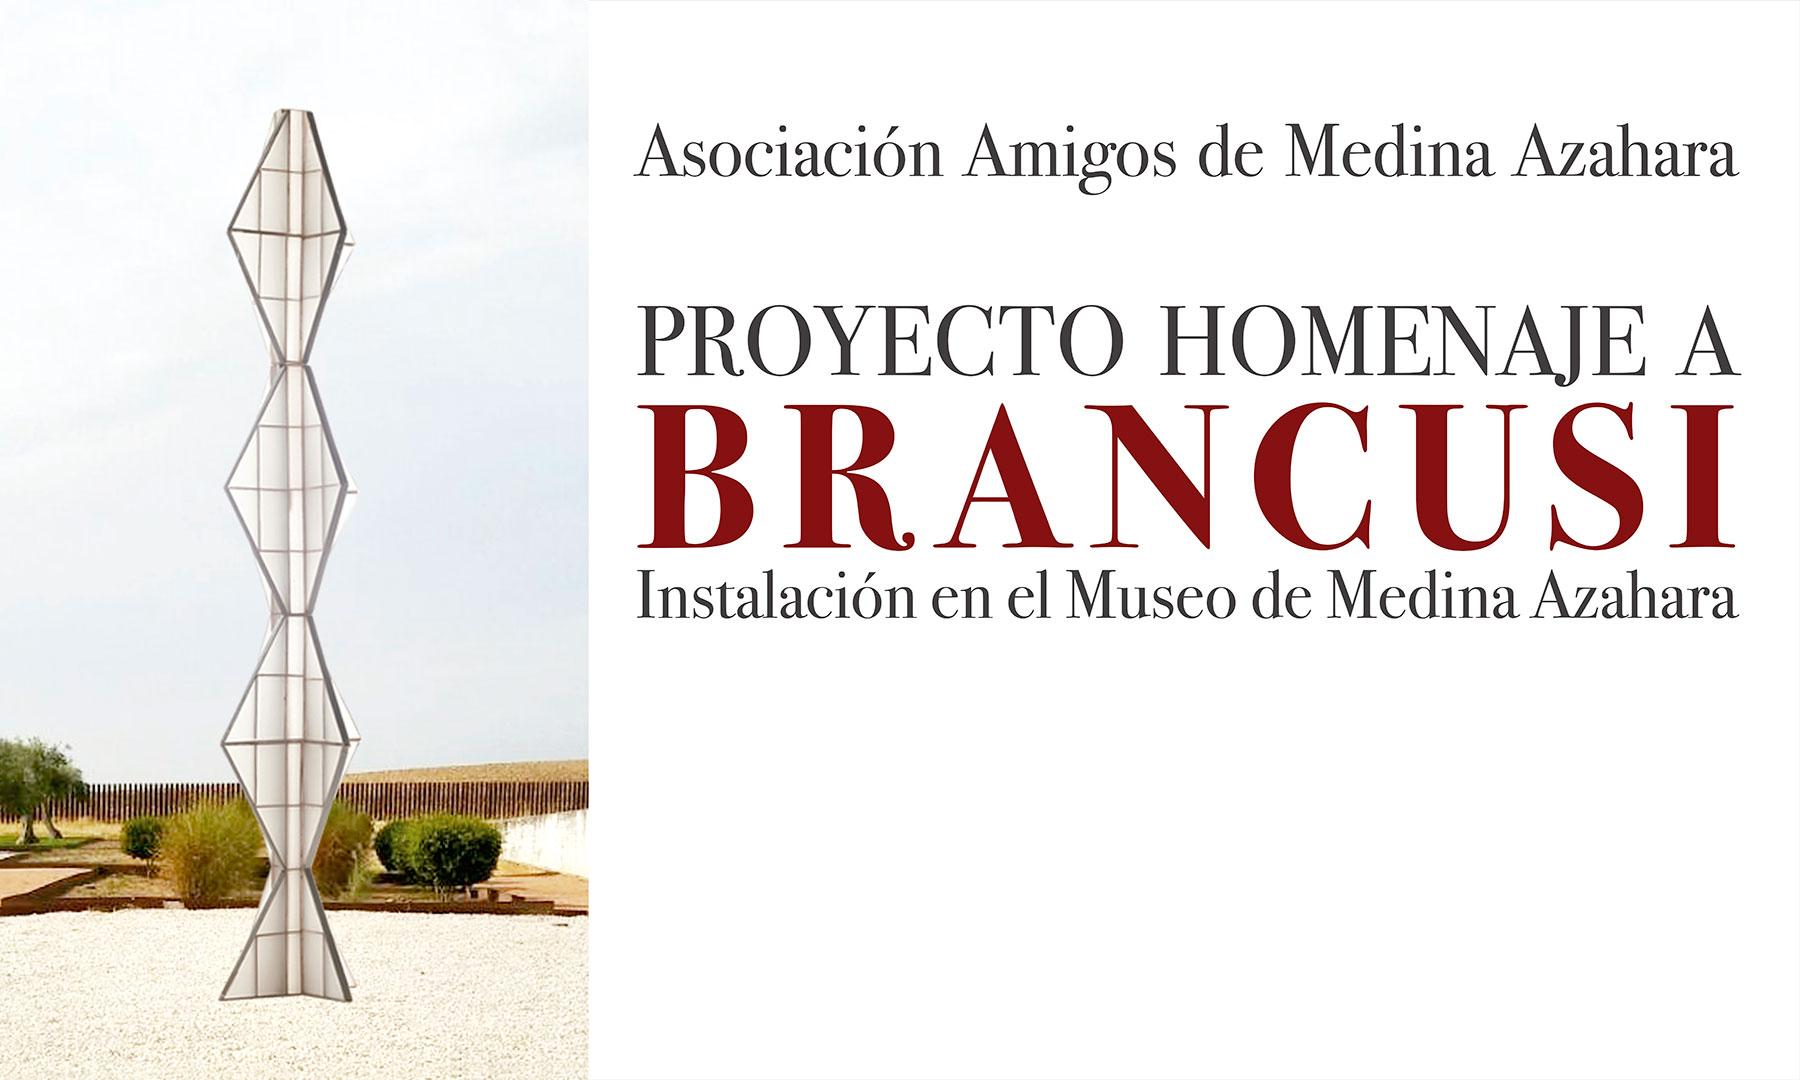 Homenaje a Brancusi / Amigos de Medina Azahara